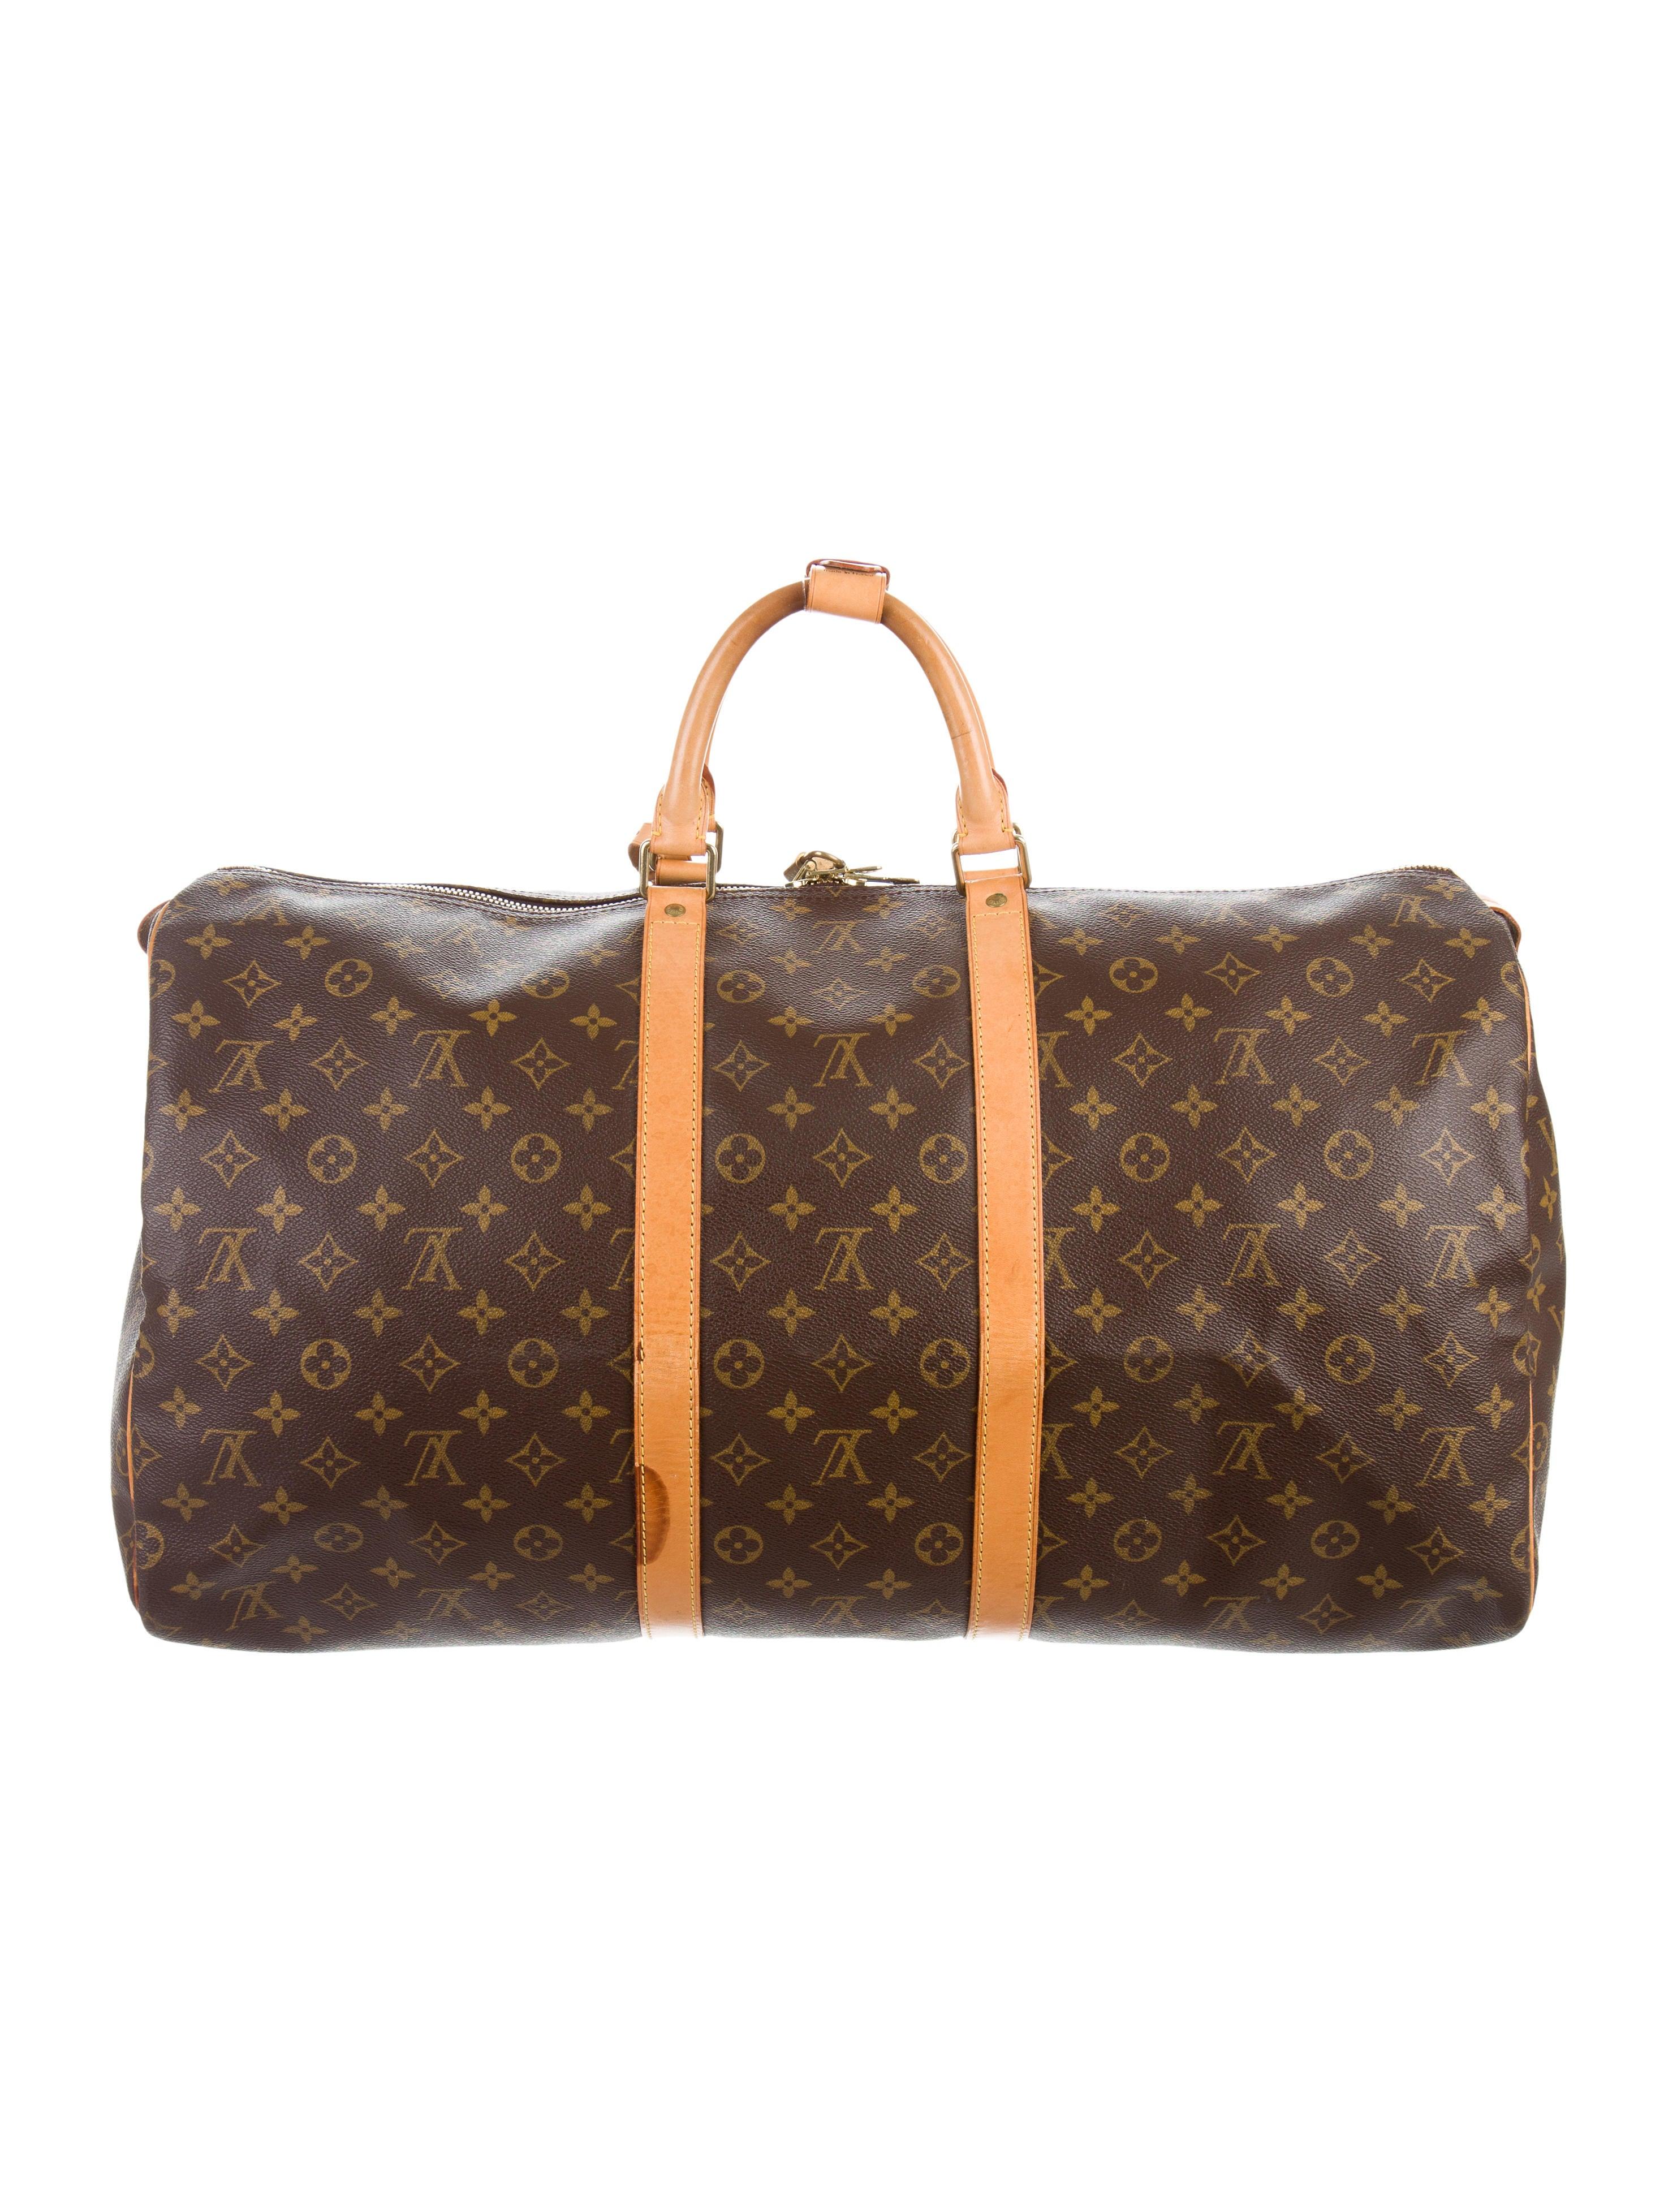 louis vuitton monogram keepall 55 bags lou122341 the realreal. Black Bedroom Furniture Sets. Home Design Ideas